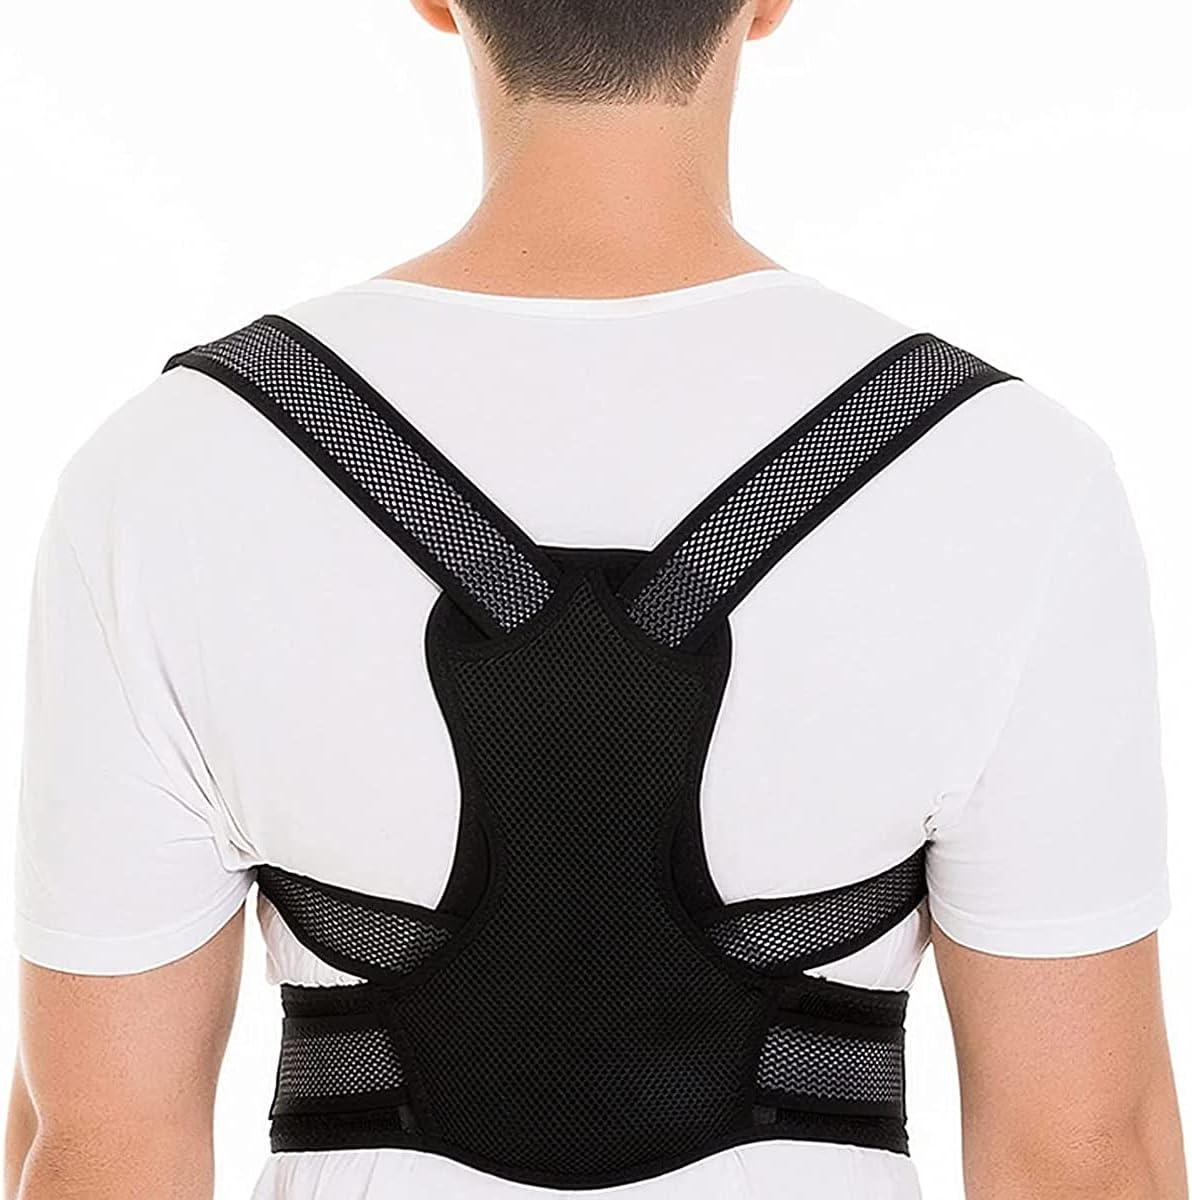 KISAD Soothing Back Support Genuine Free Shipping Correct Posture Max 44% OFF Adjustable Belt